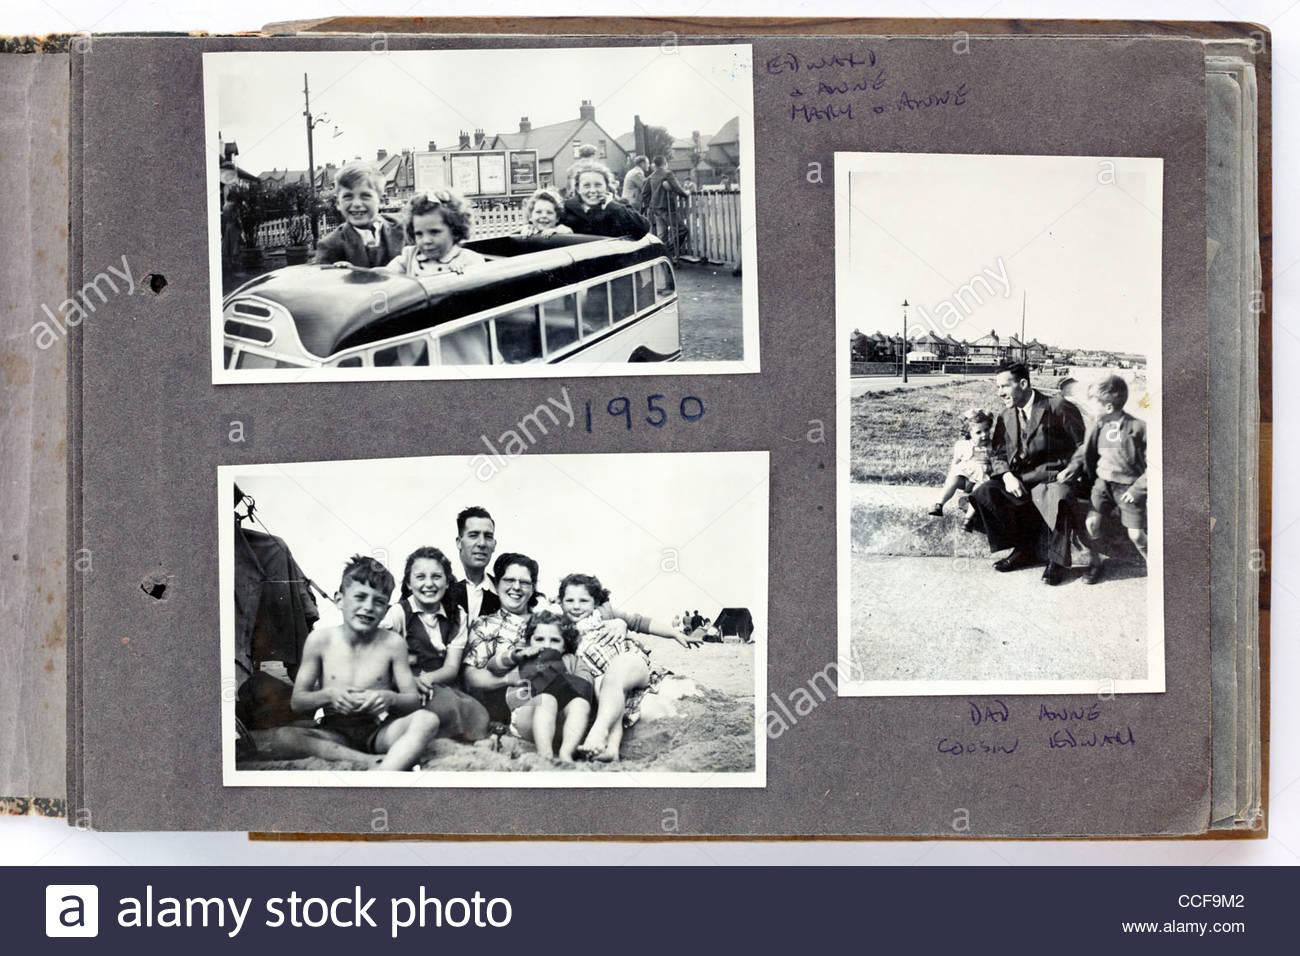 Felices momentos familiares photo album Página 1950 Inglaterra Imagen De Stock